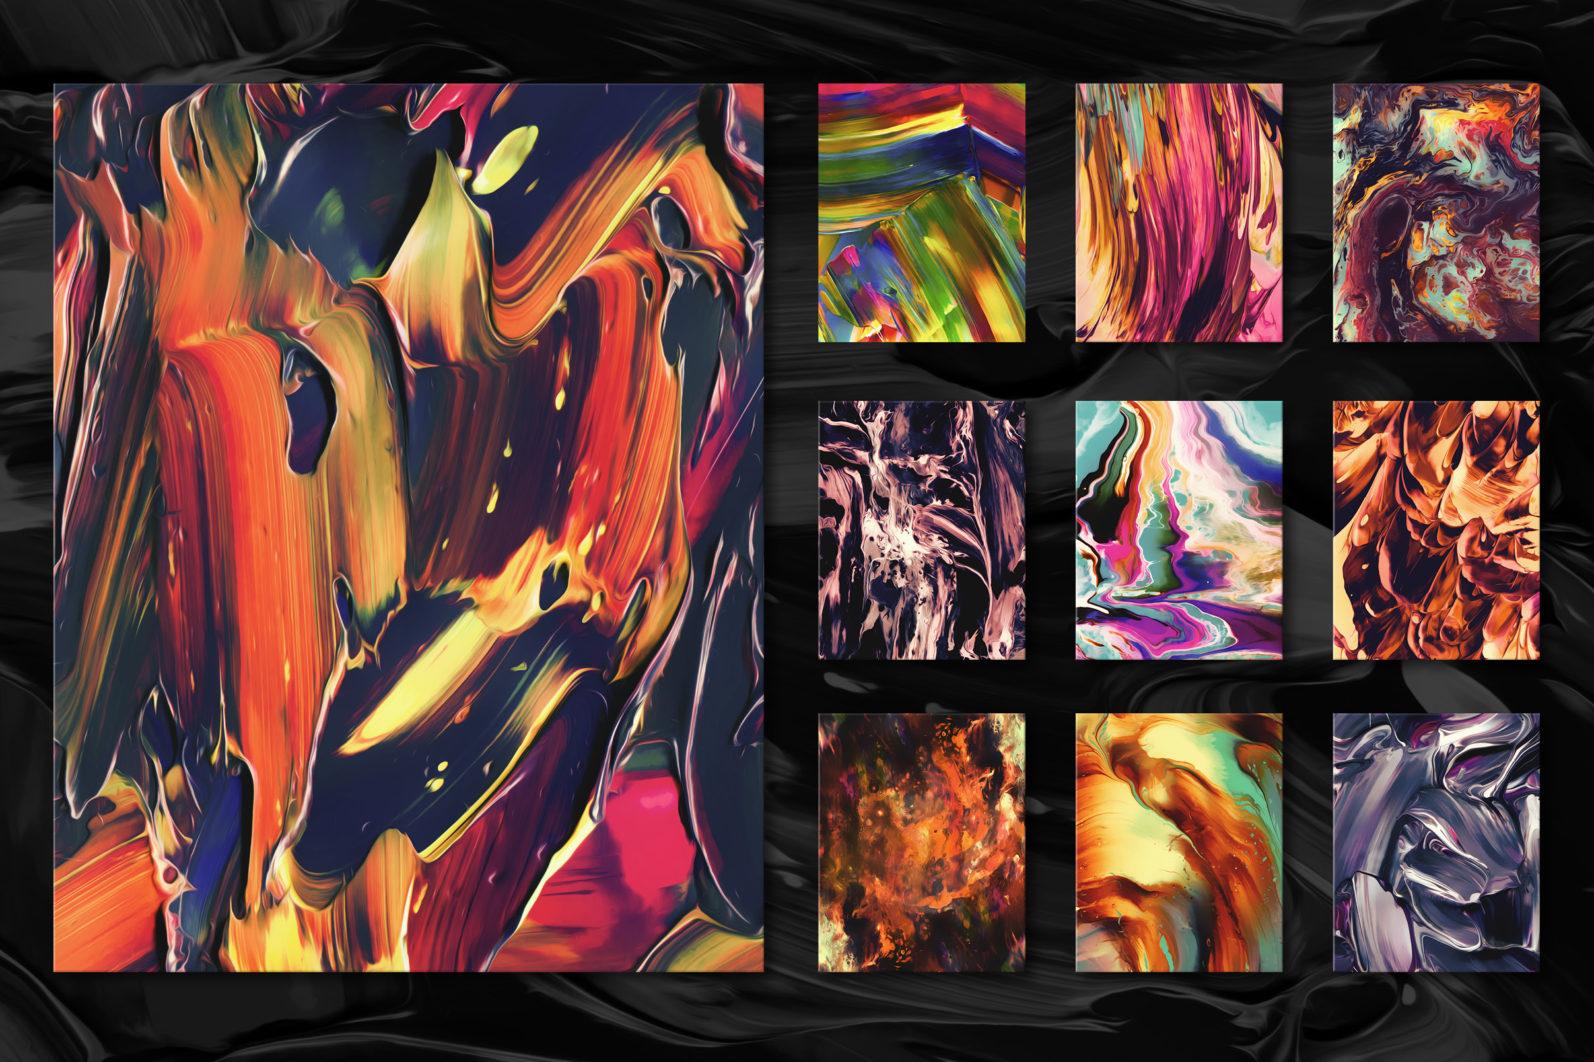 Flow, Vol. 2: 100 Smooth Paint Textures - Flow Vol 2 Preview 14 -